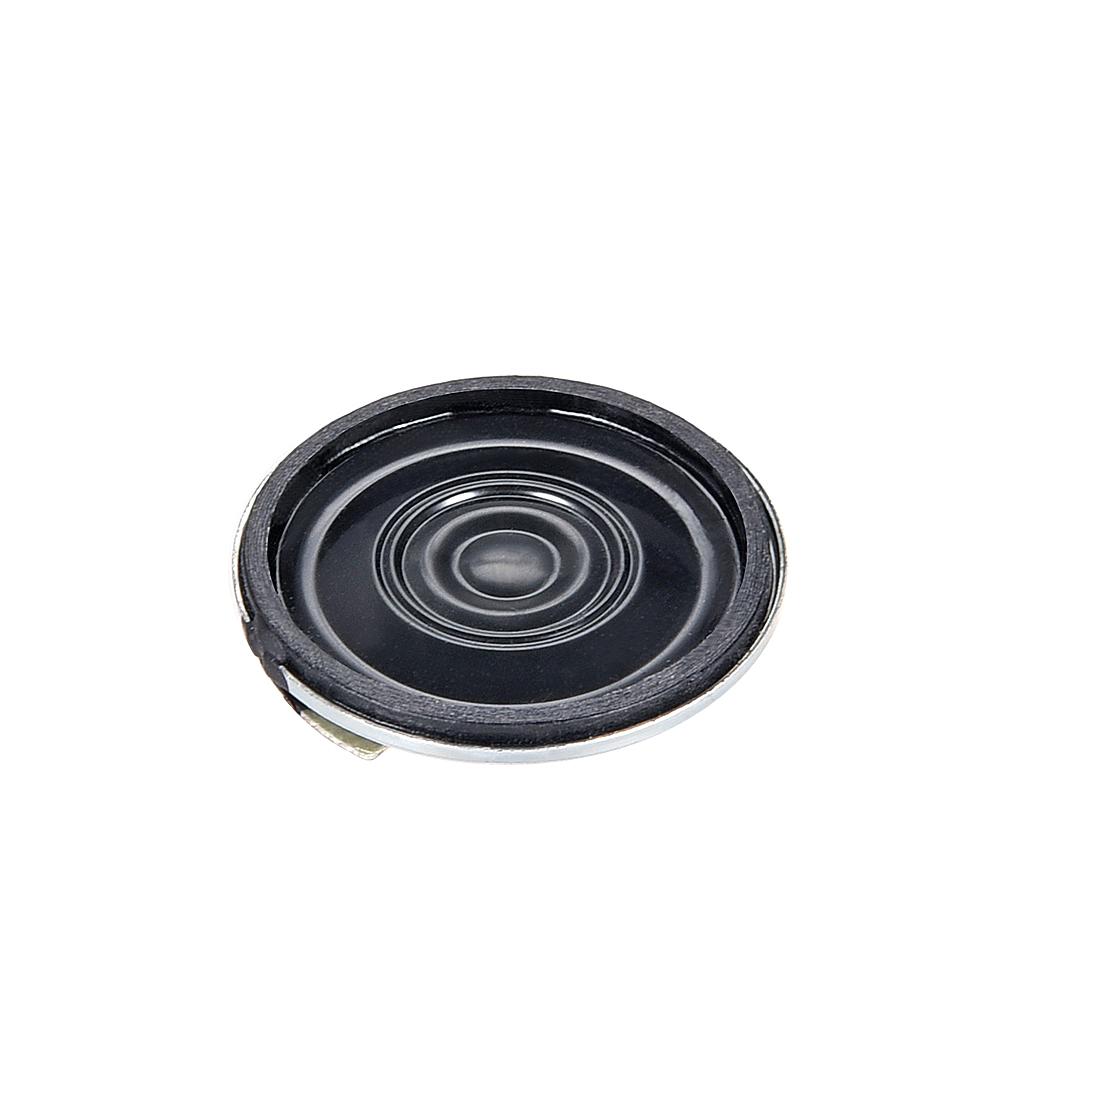 1W 8 Ohm Speaker 26mm Round Shape Loudspeaker for DIY Audio Speakers 4pcs - image 2 de 3